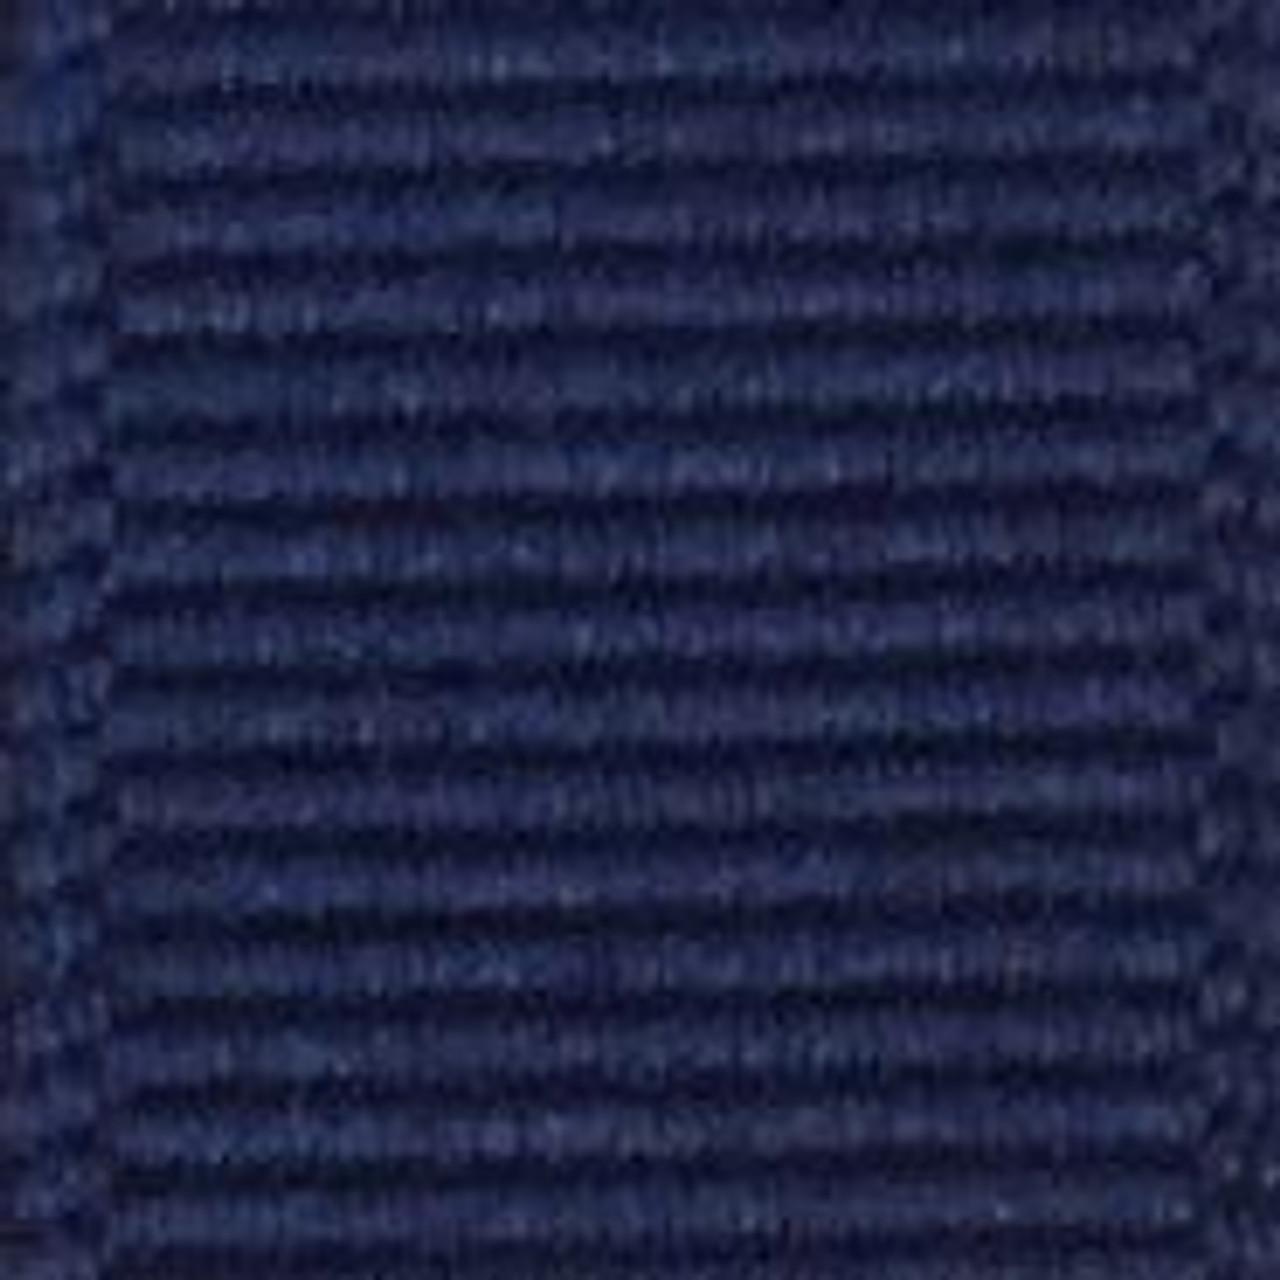 Light Navy Offray Grosgrain Ribbon